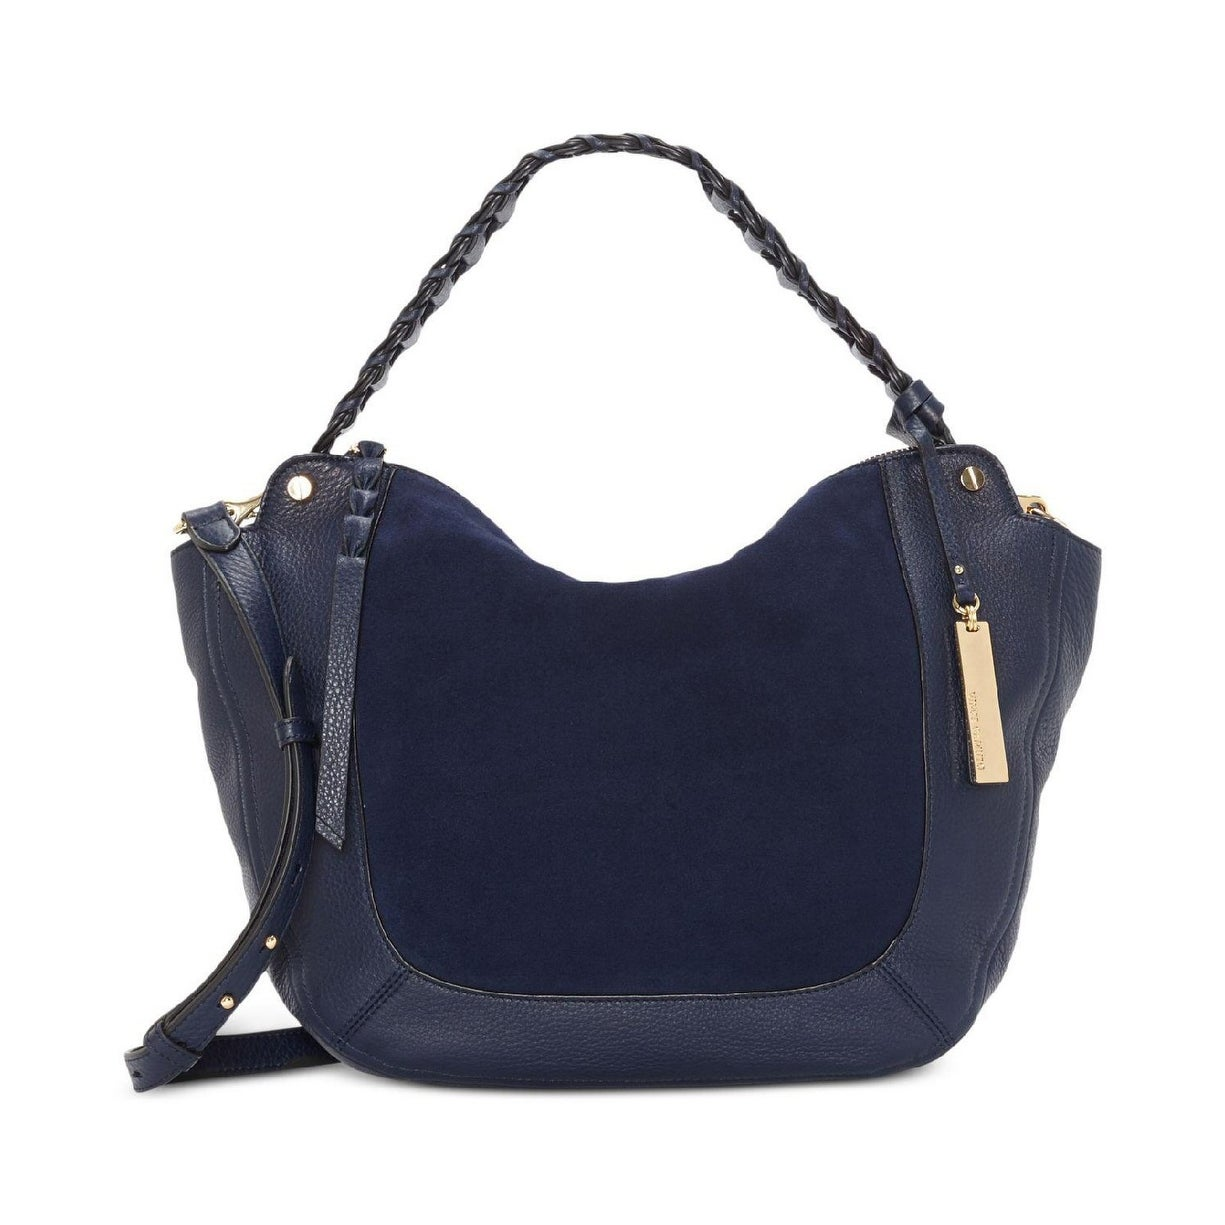 048eba9d51 Shop Vince Camuto Luela Small Leather Shoulder Bag Winter Navy ...